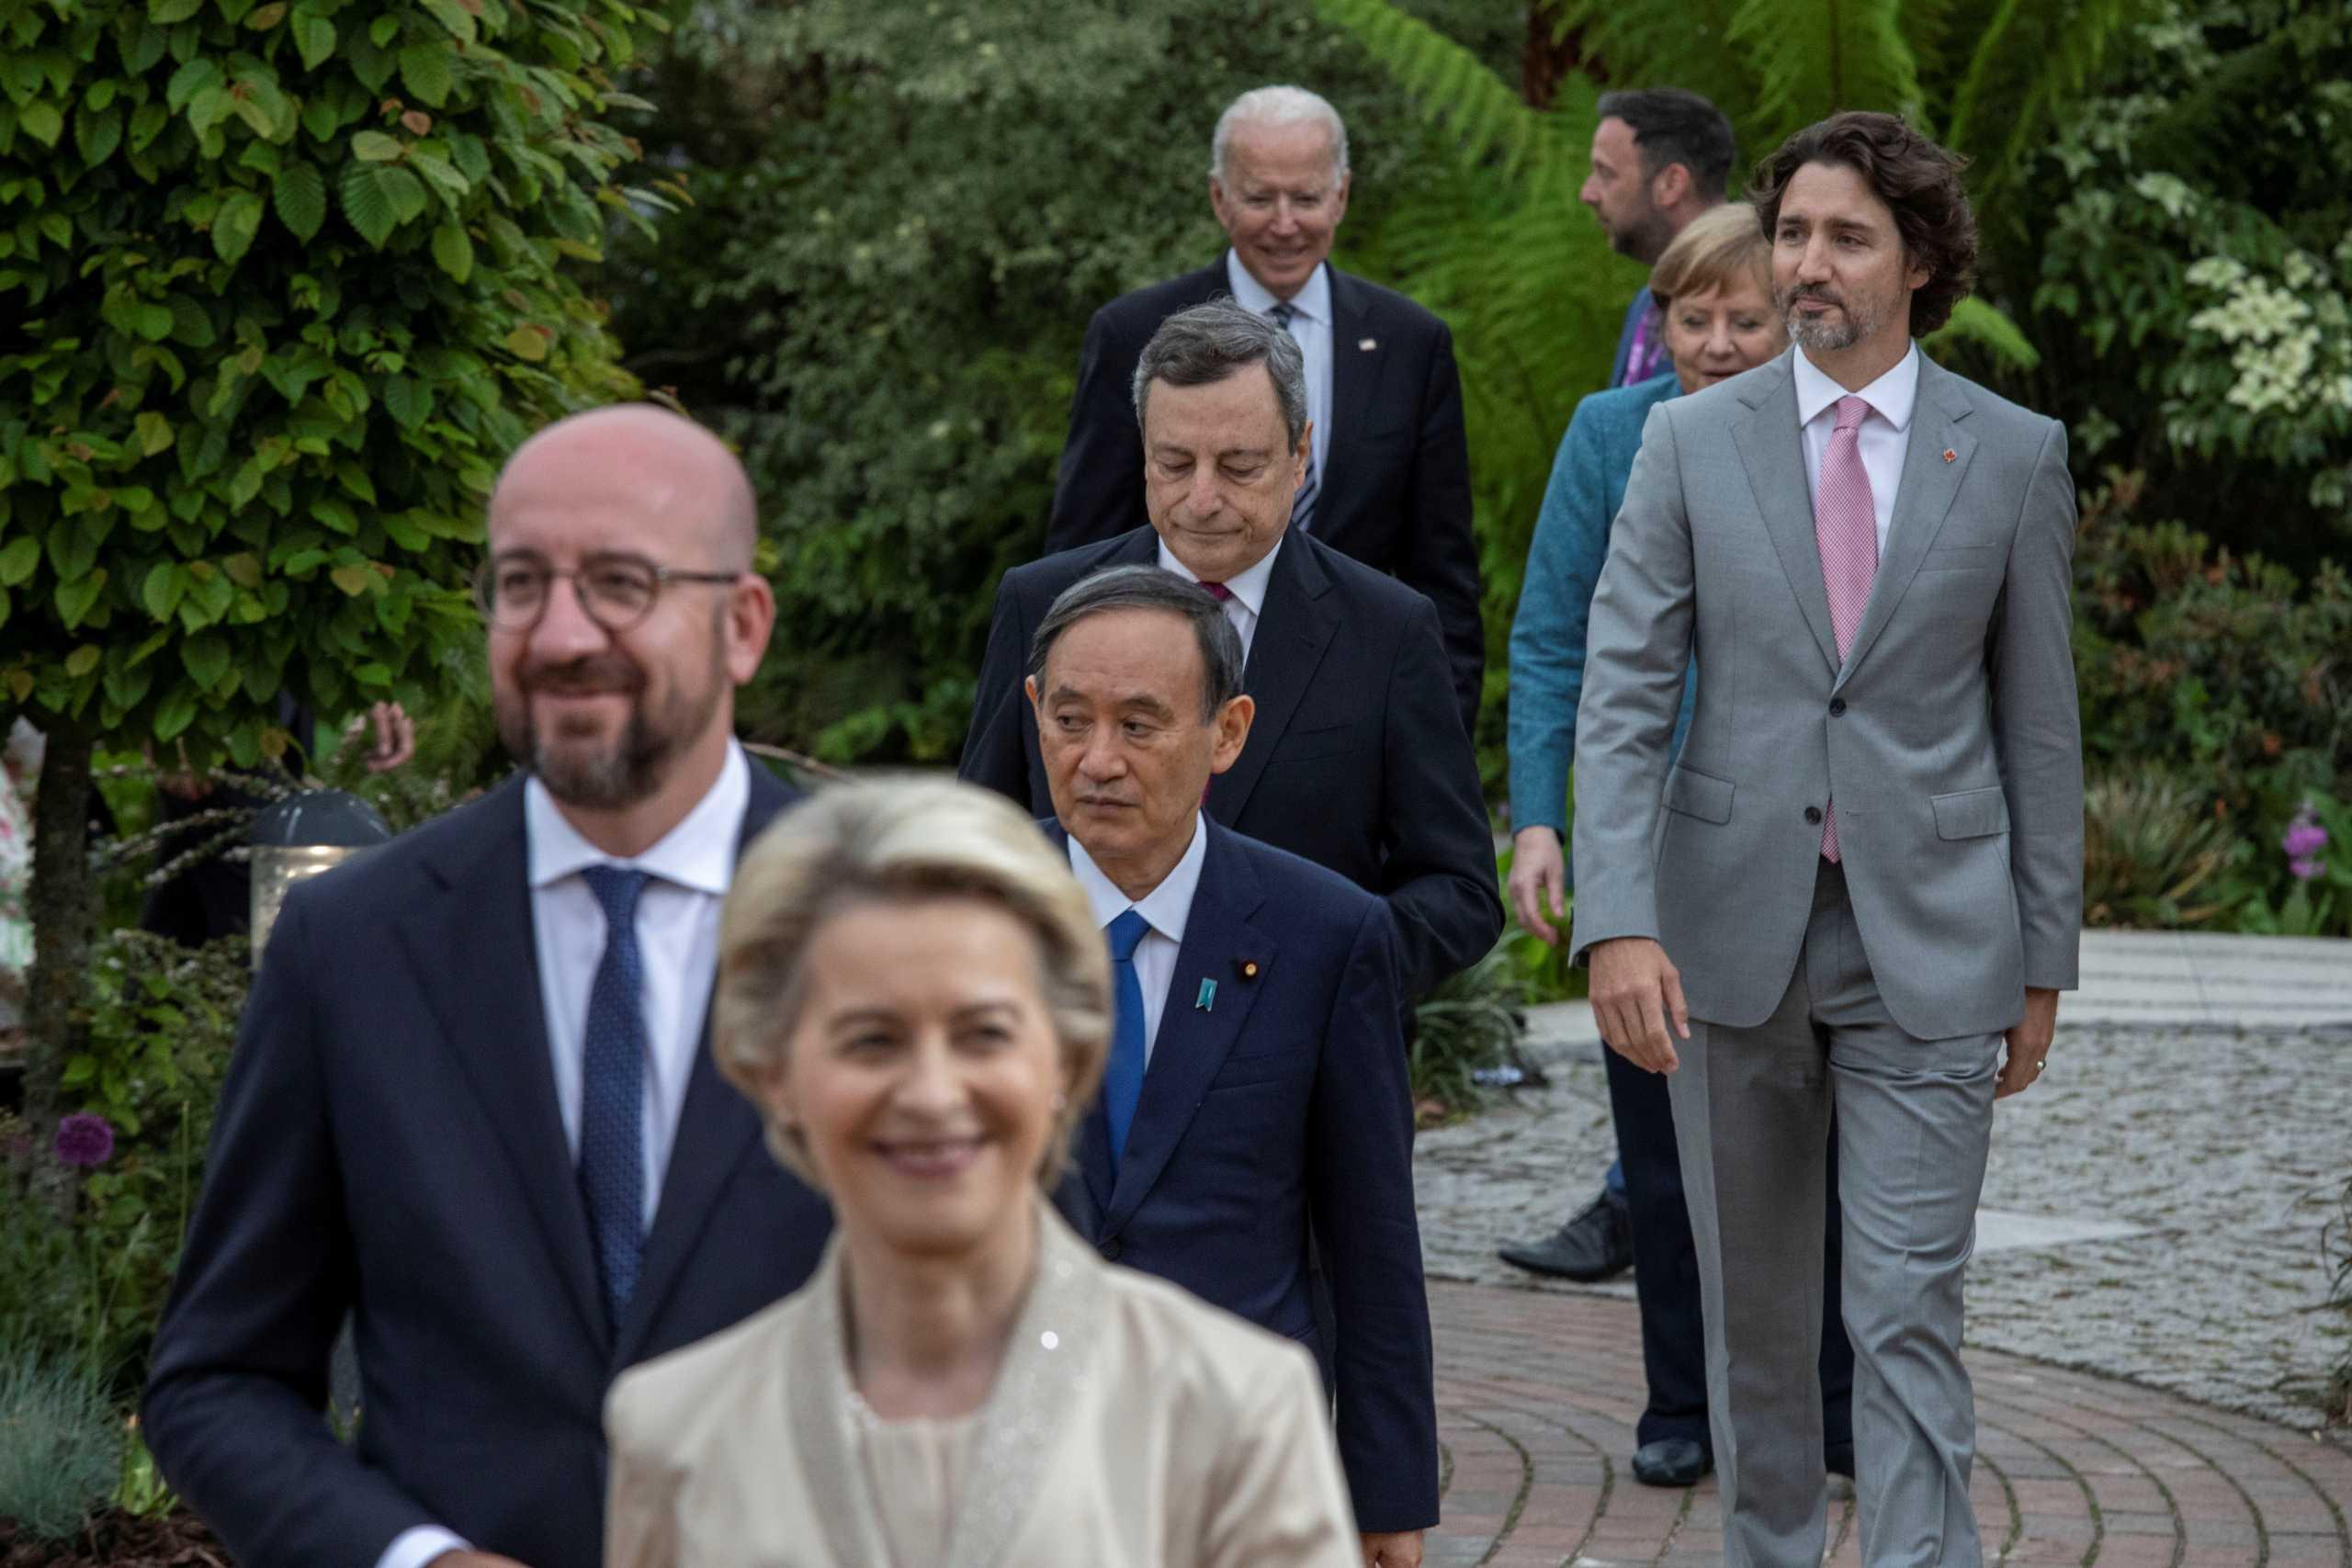 G7: Σε εξέλιξη μία από τις σημαντικότερες συνόδους των τελευταίων δεκαετιών